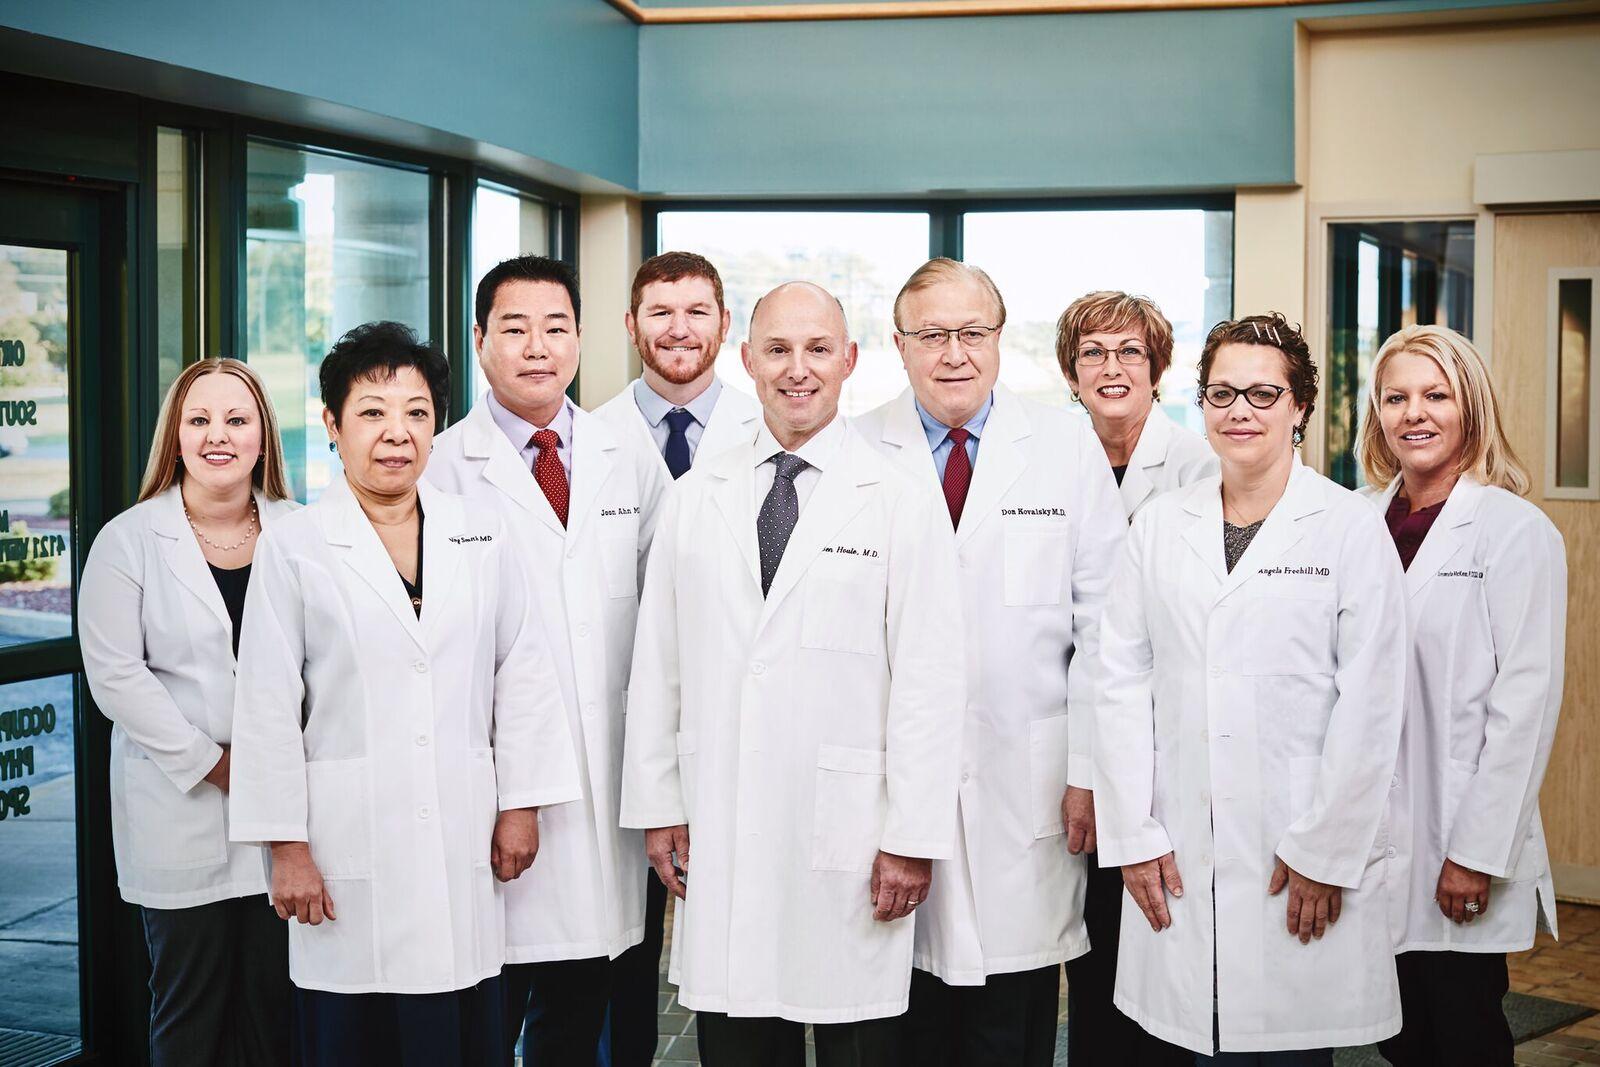 Orthopaedic Center Of Southern Illinois | We Fix Bones